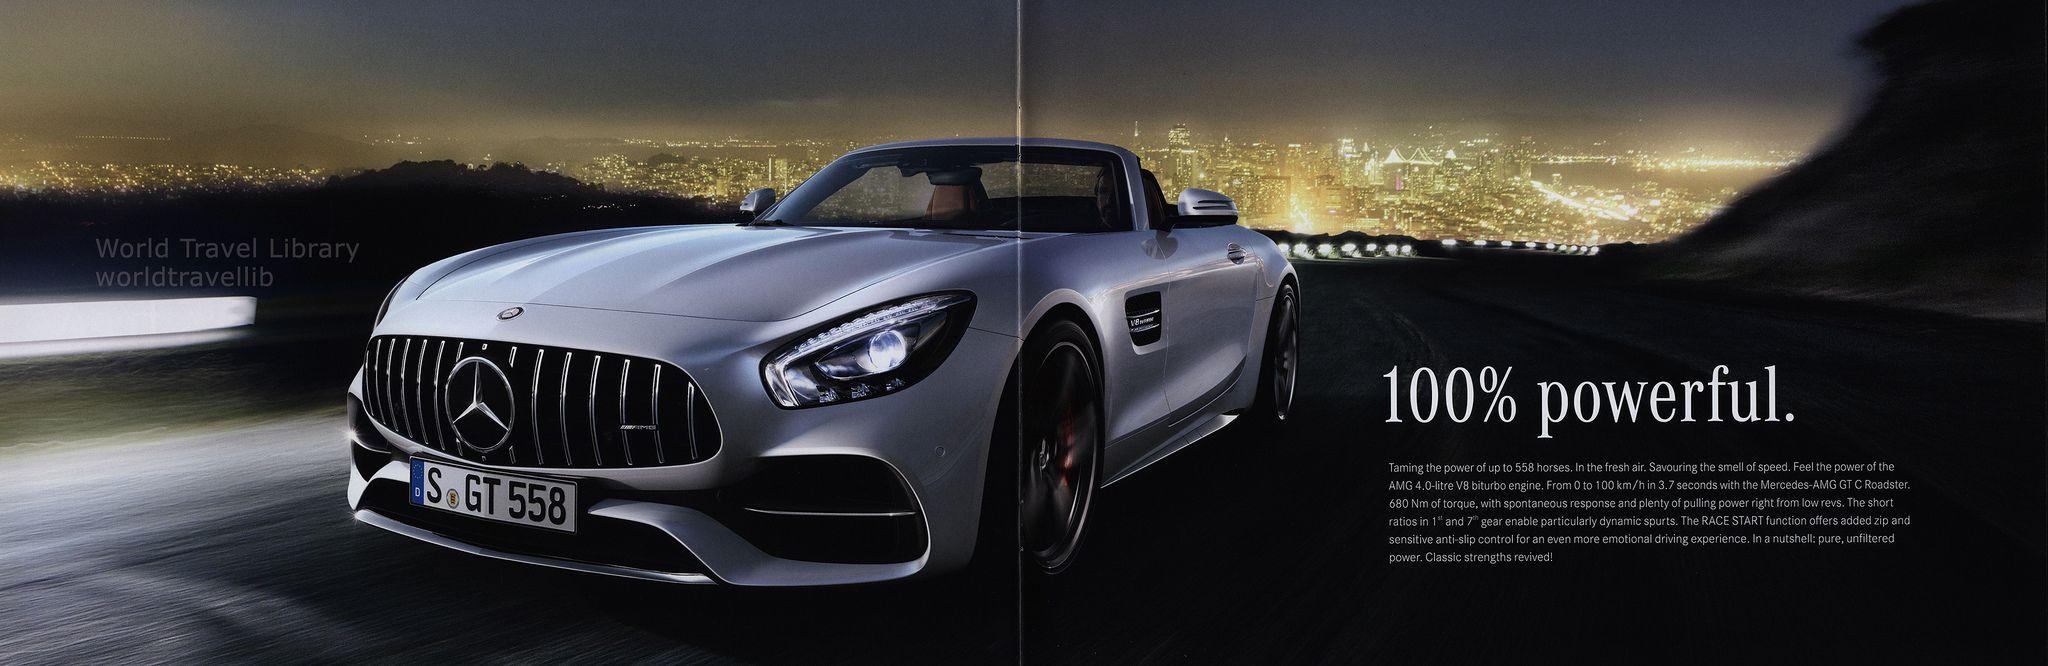 https://flic.kr/p/UH3zX5   Mercedes-Benz AMG GT Roadster;  2016_4